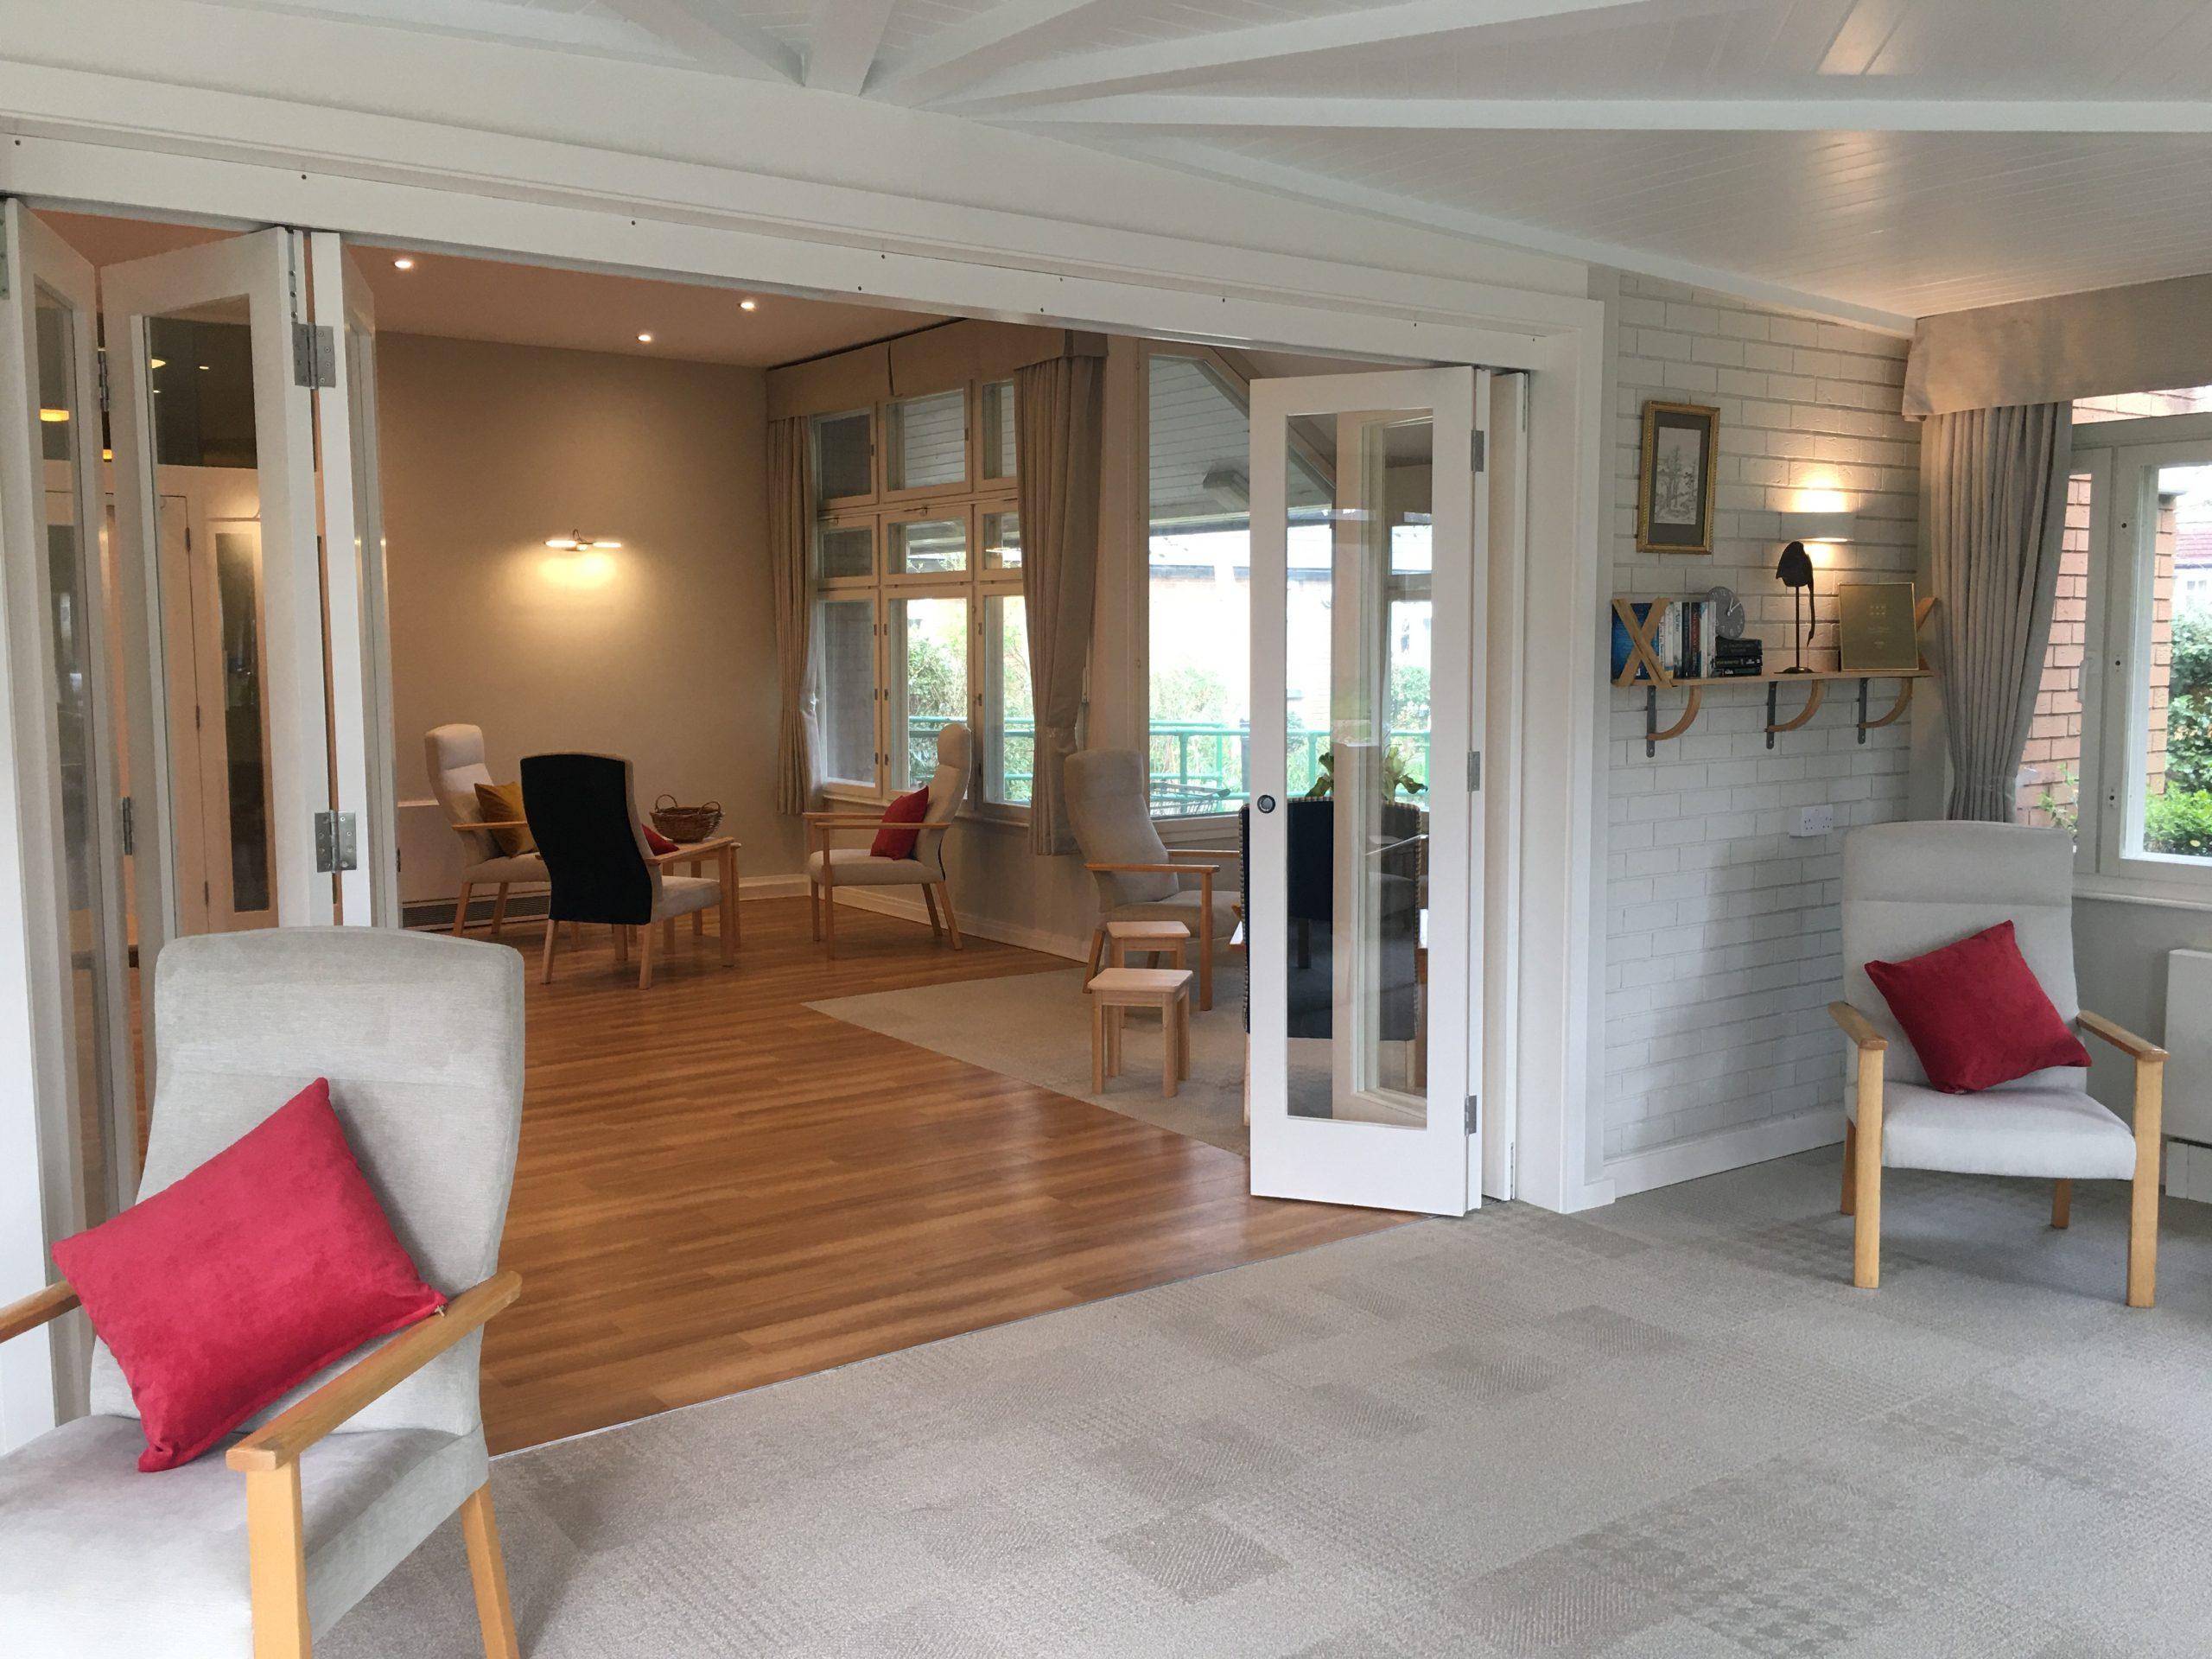 Walsingham Lodge sheltered housing for elderly people